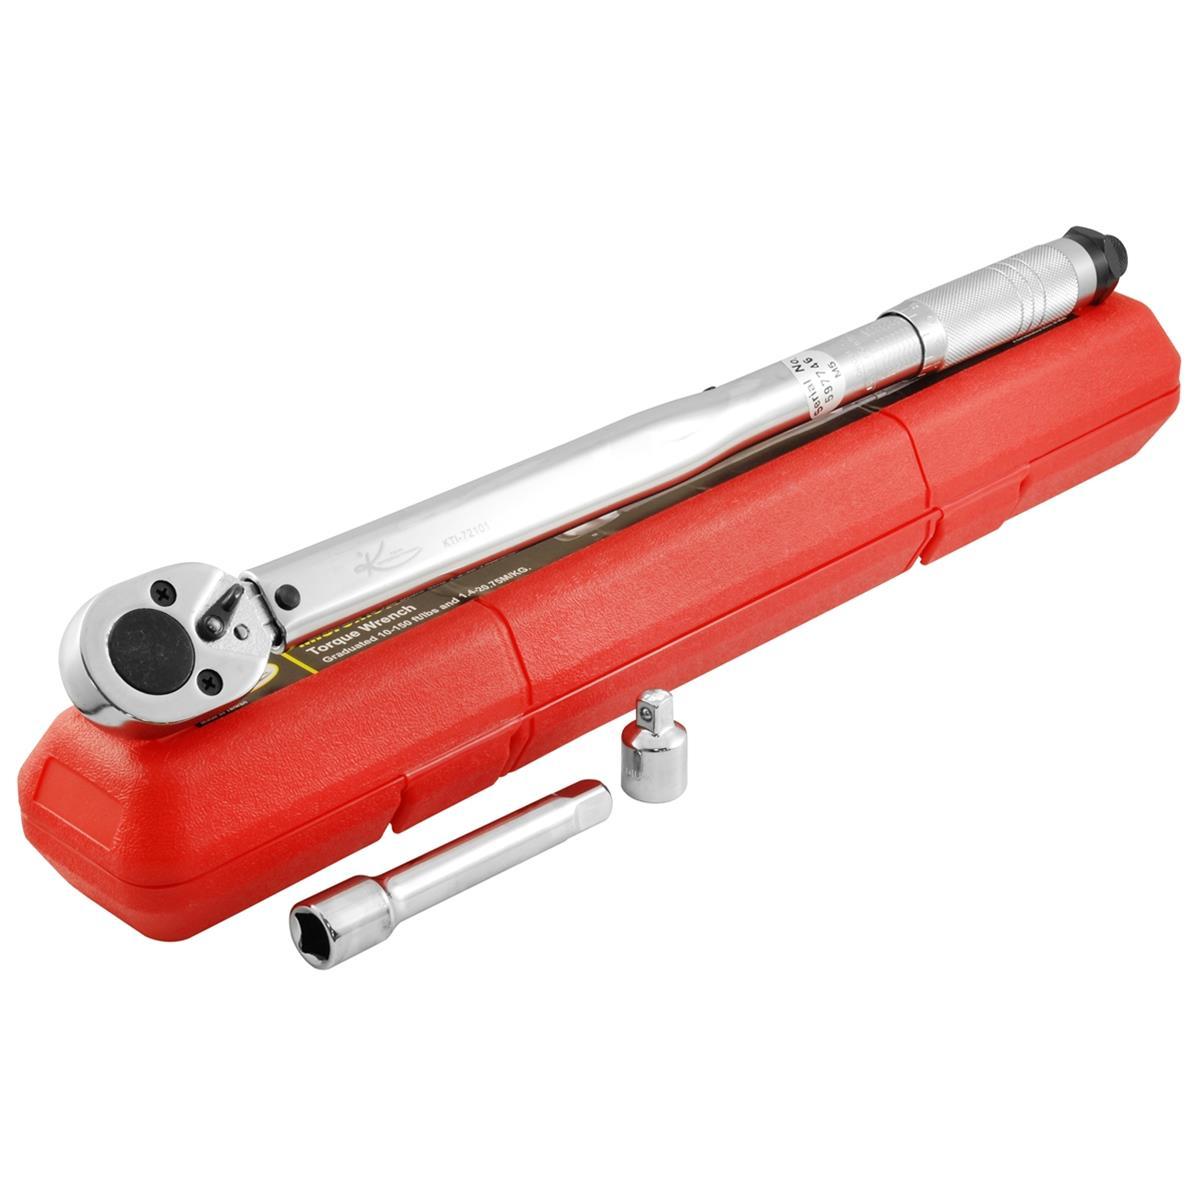 KTI KTI-72101 Torque Wrench